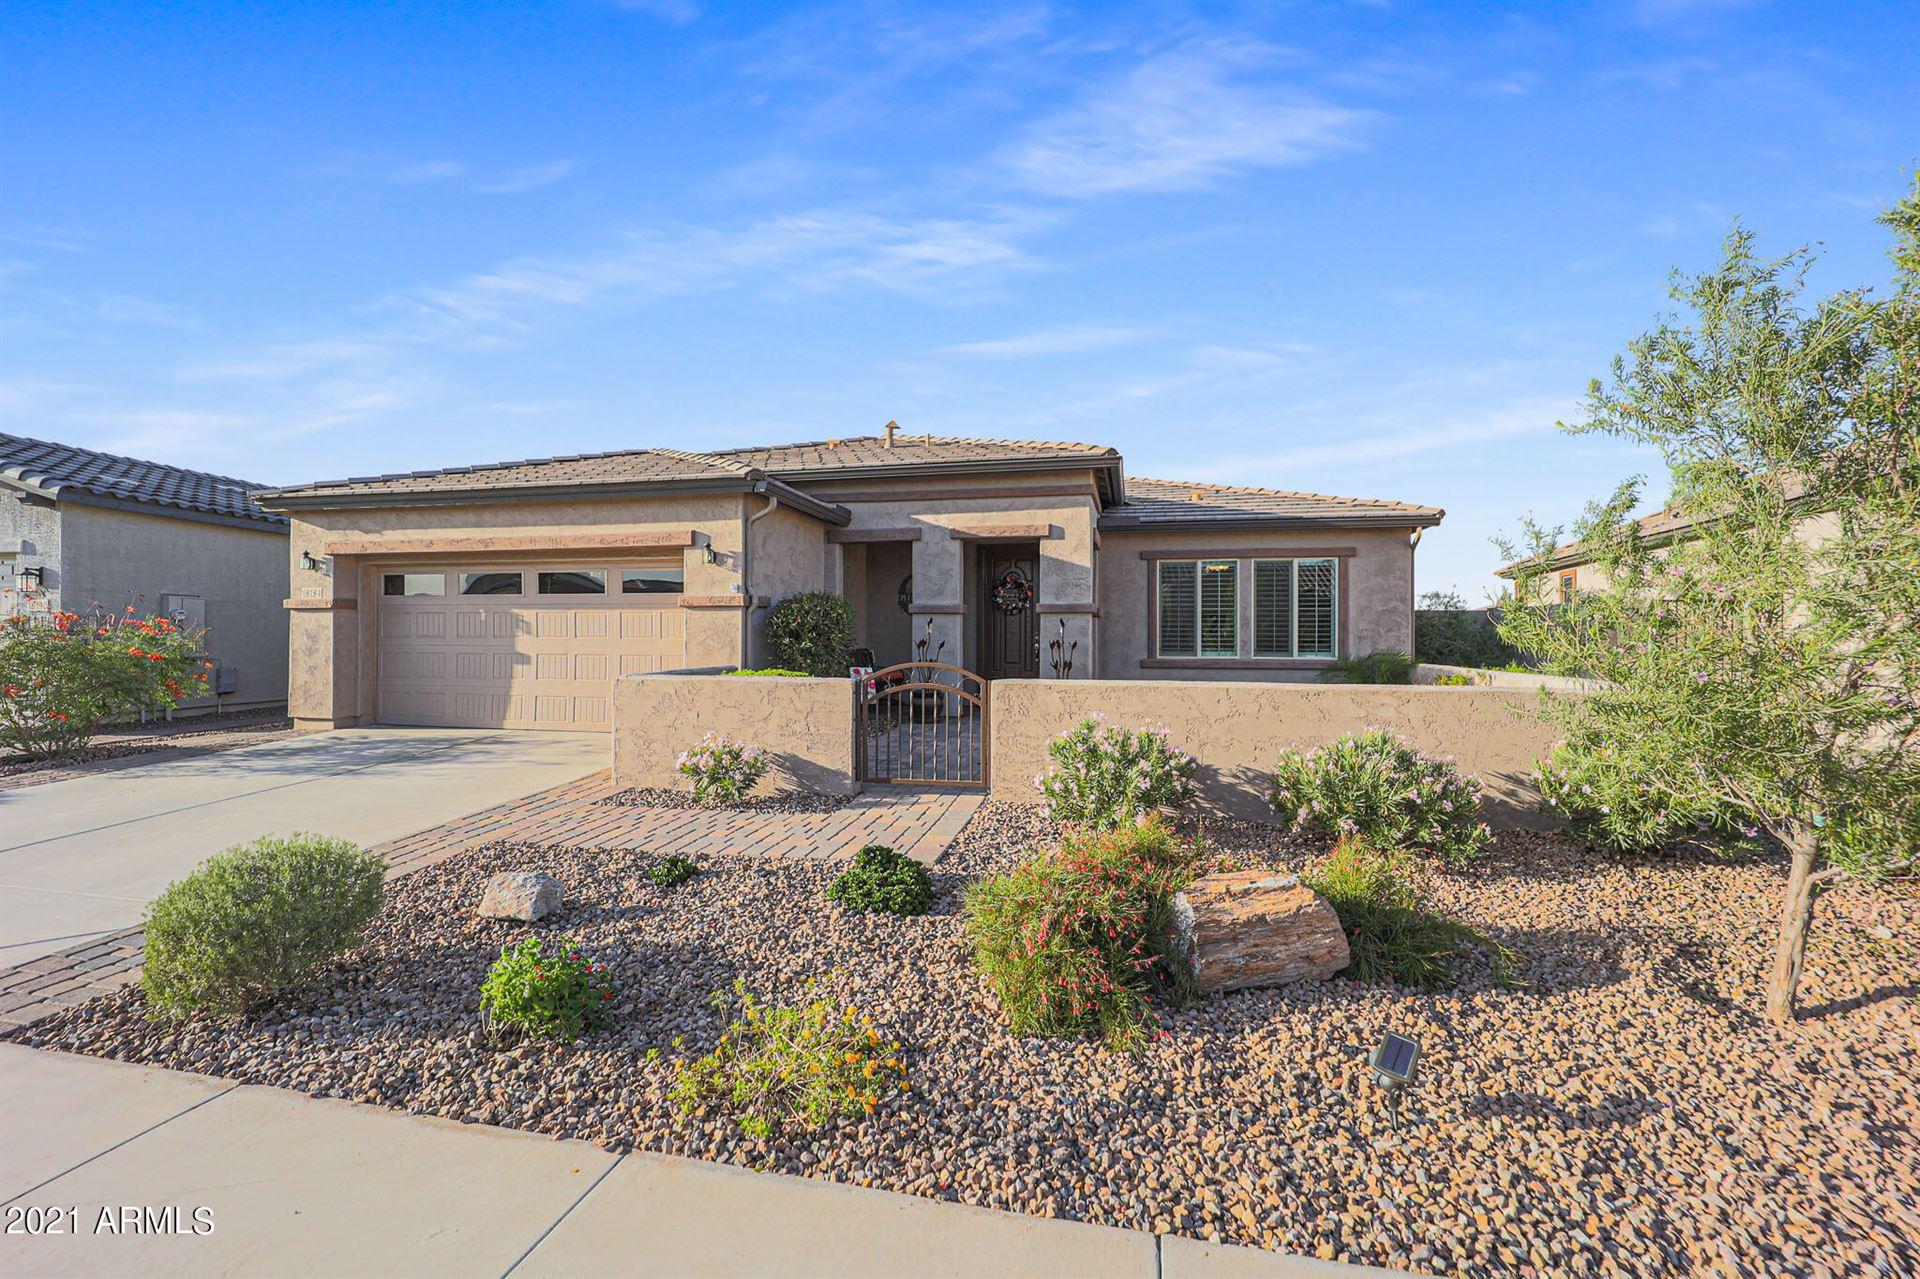 Photo of 18184 W DEER CREEK Road, Goodyear, AZ 85338 (MLS # 6307368)